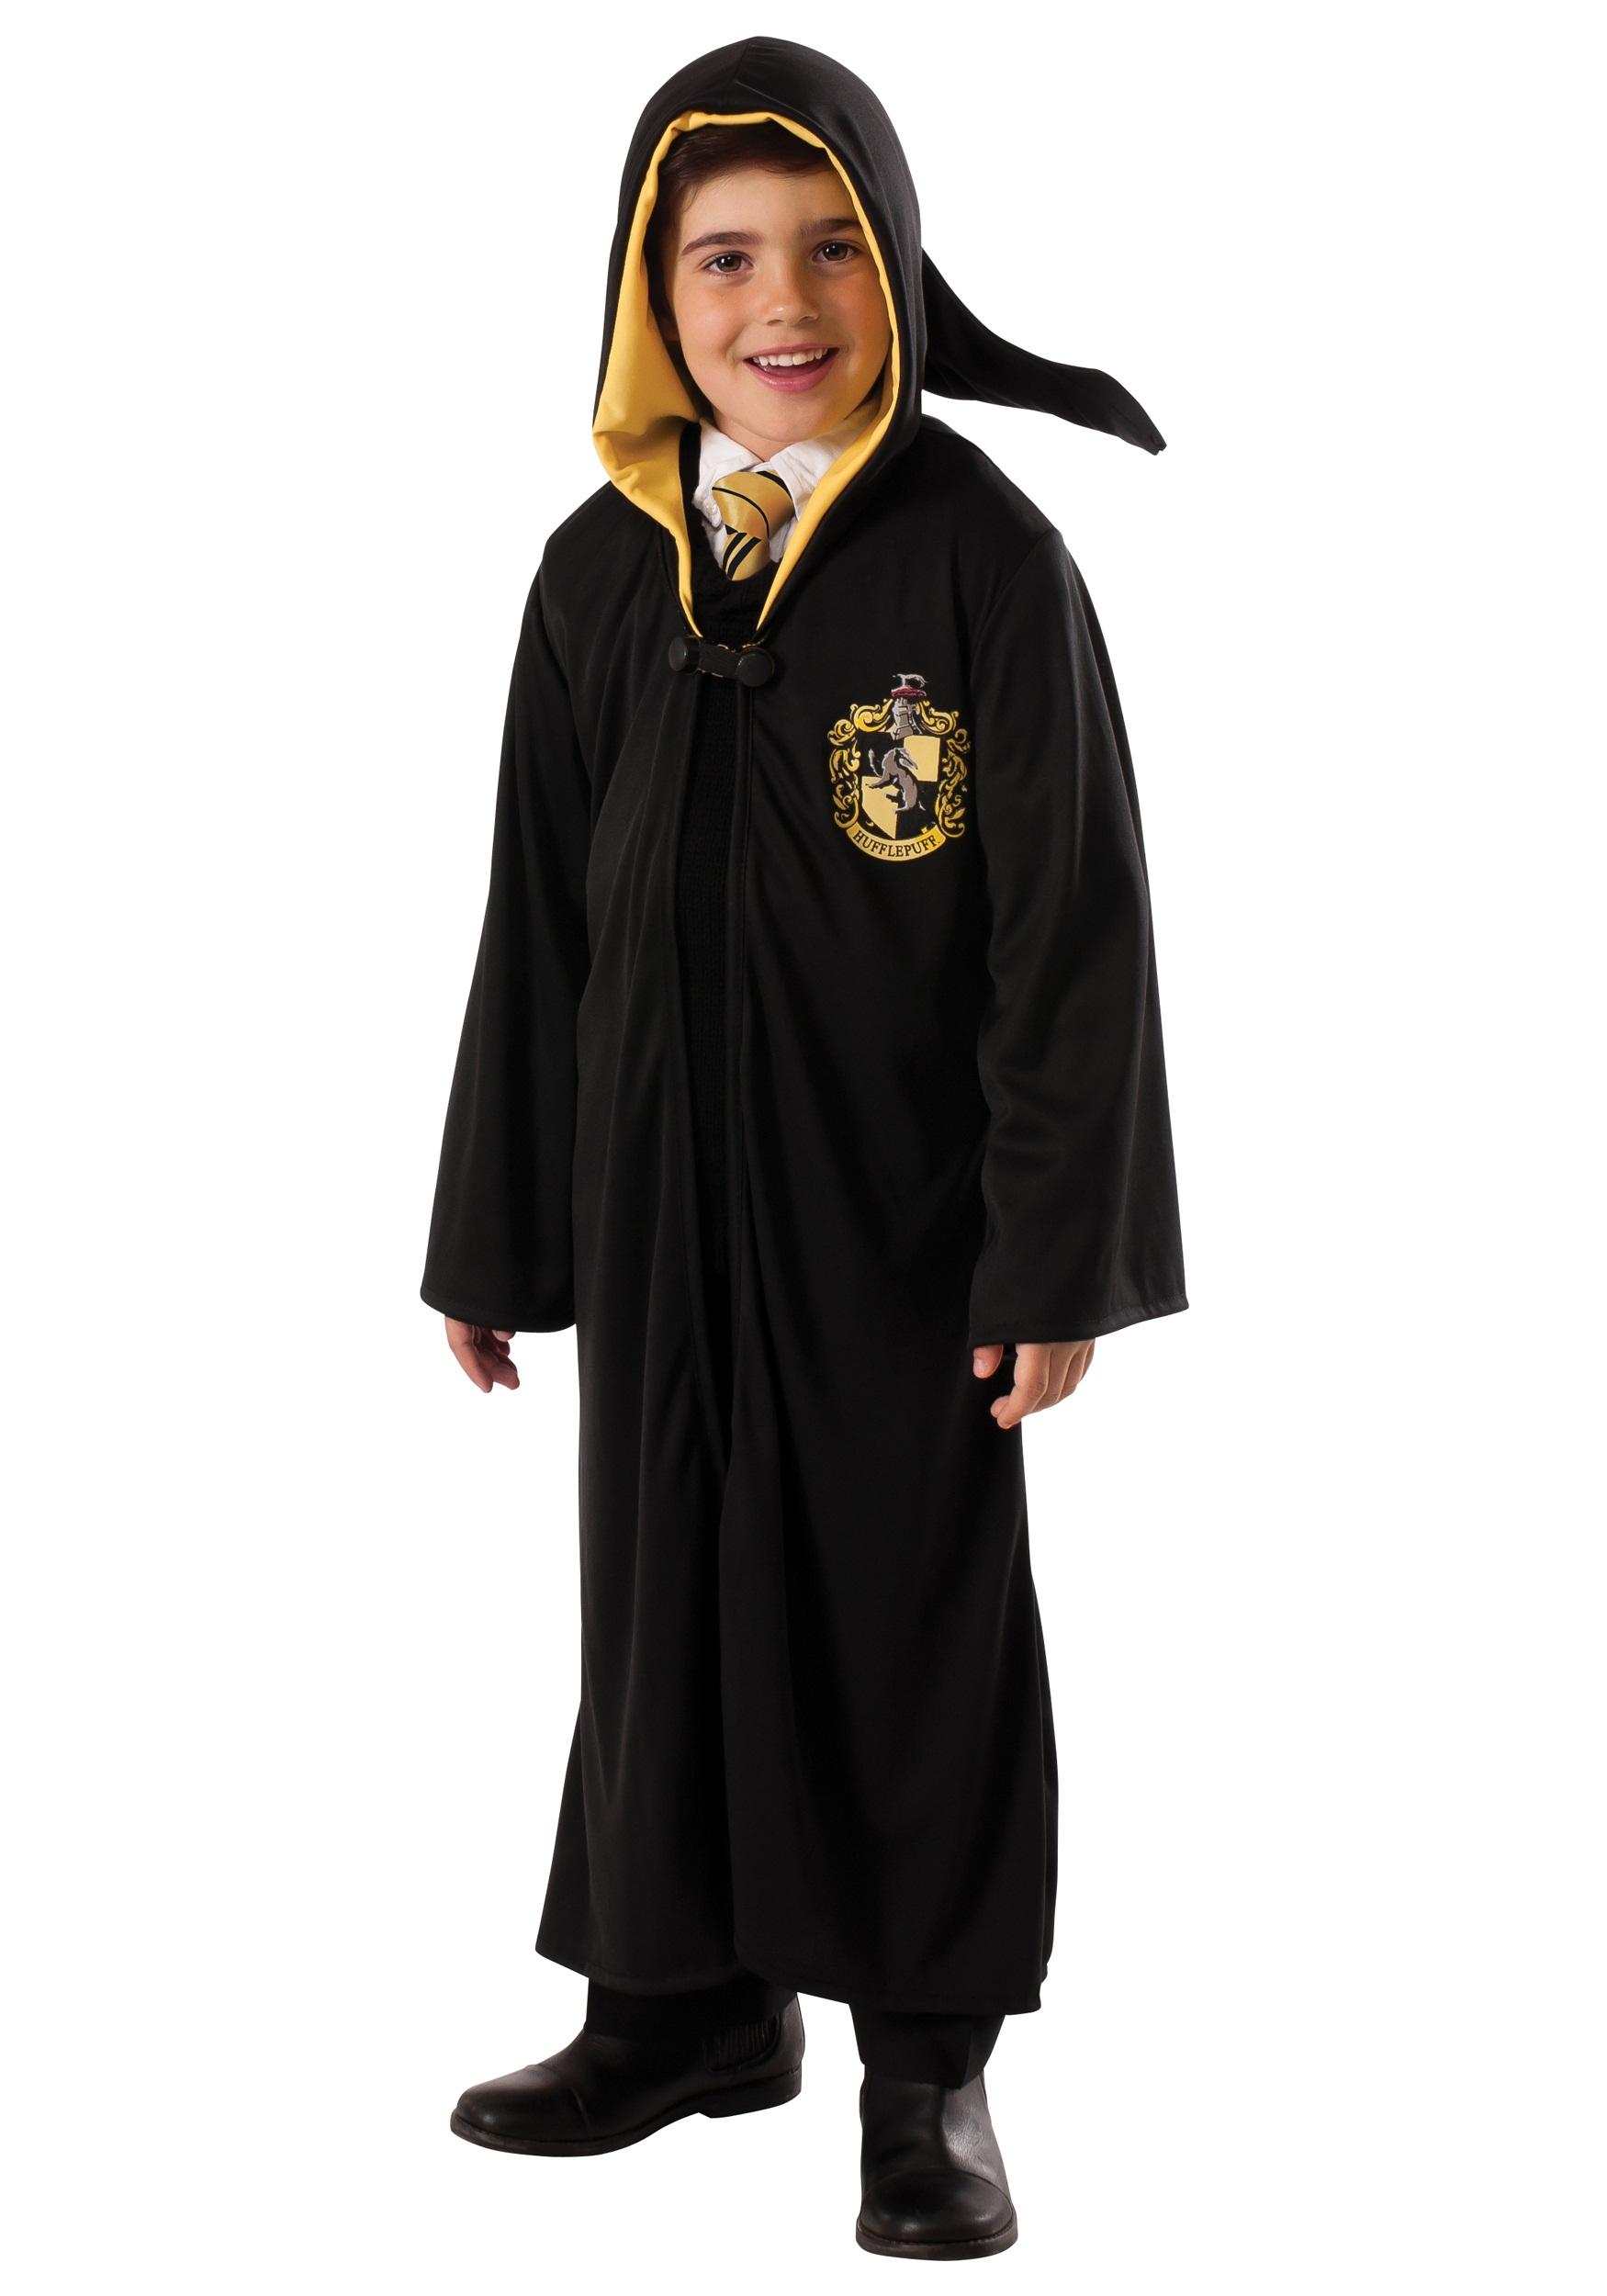 Hogwarts Hufflepuff Robe Costume for Kids